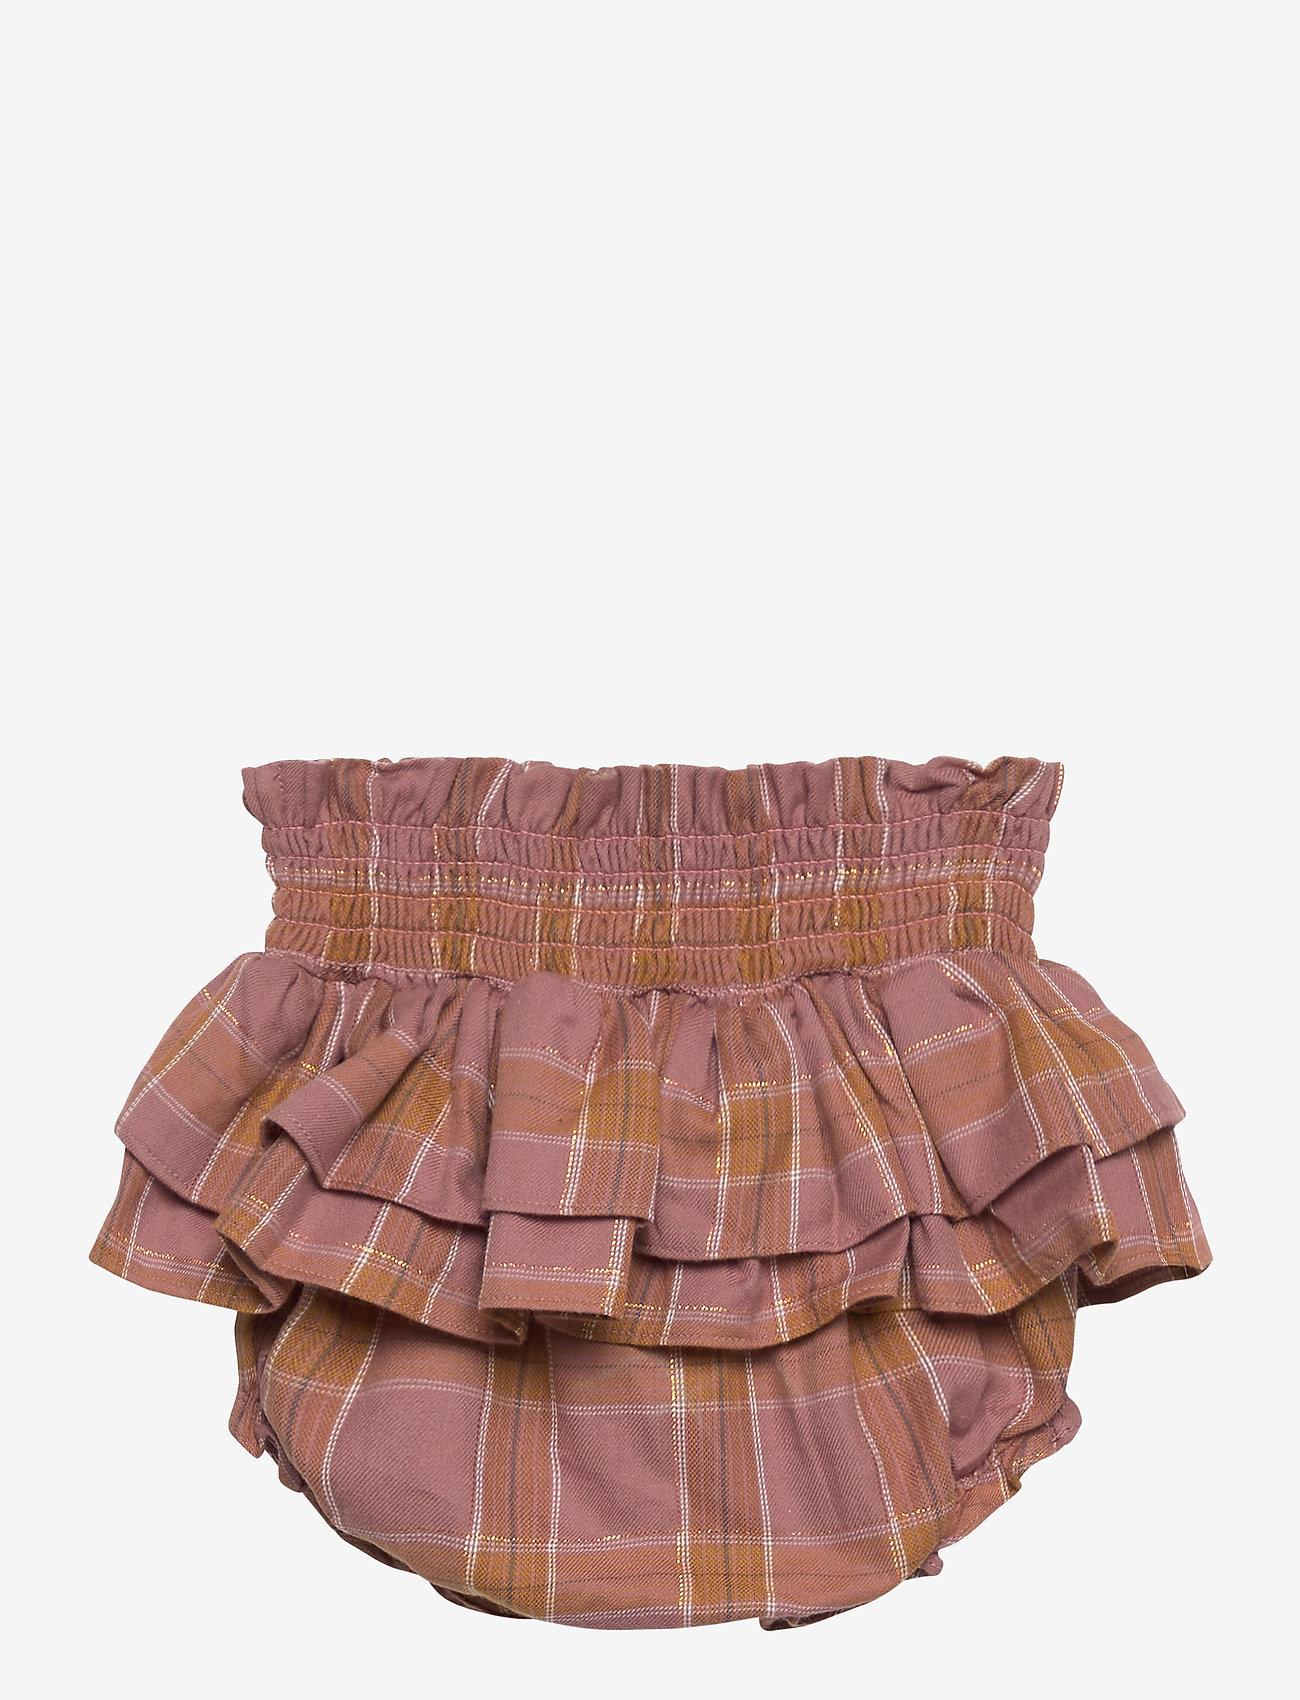 Hilma - Shorts (Burlwood) (32.95 €) - Hust & Claire 1j704